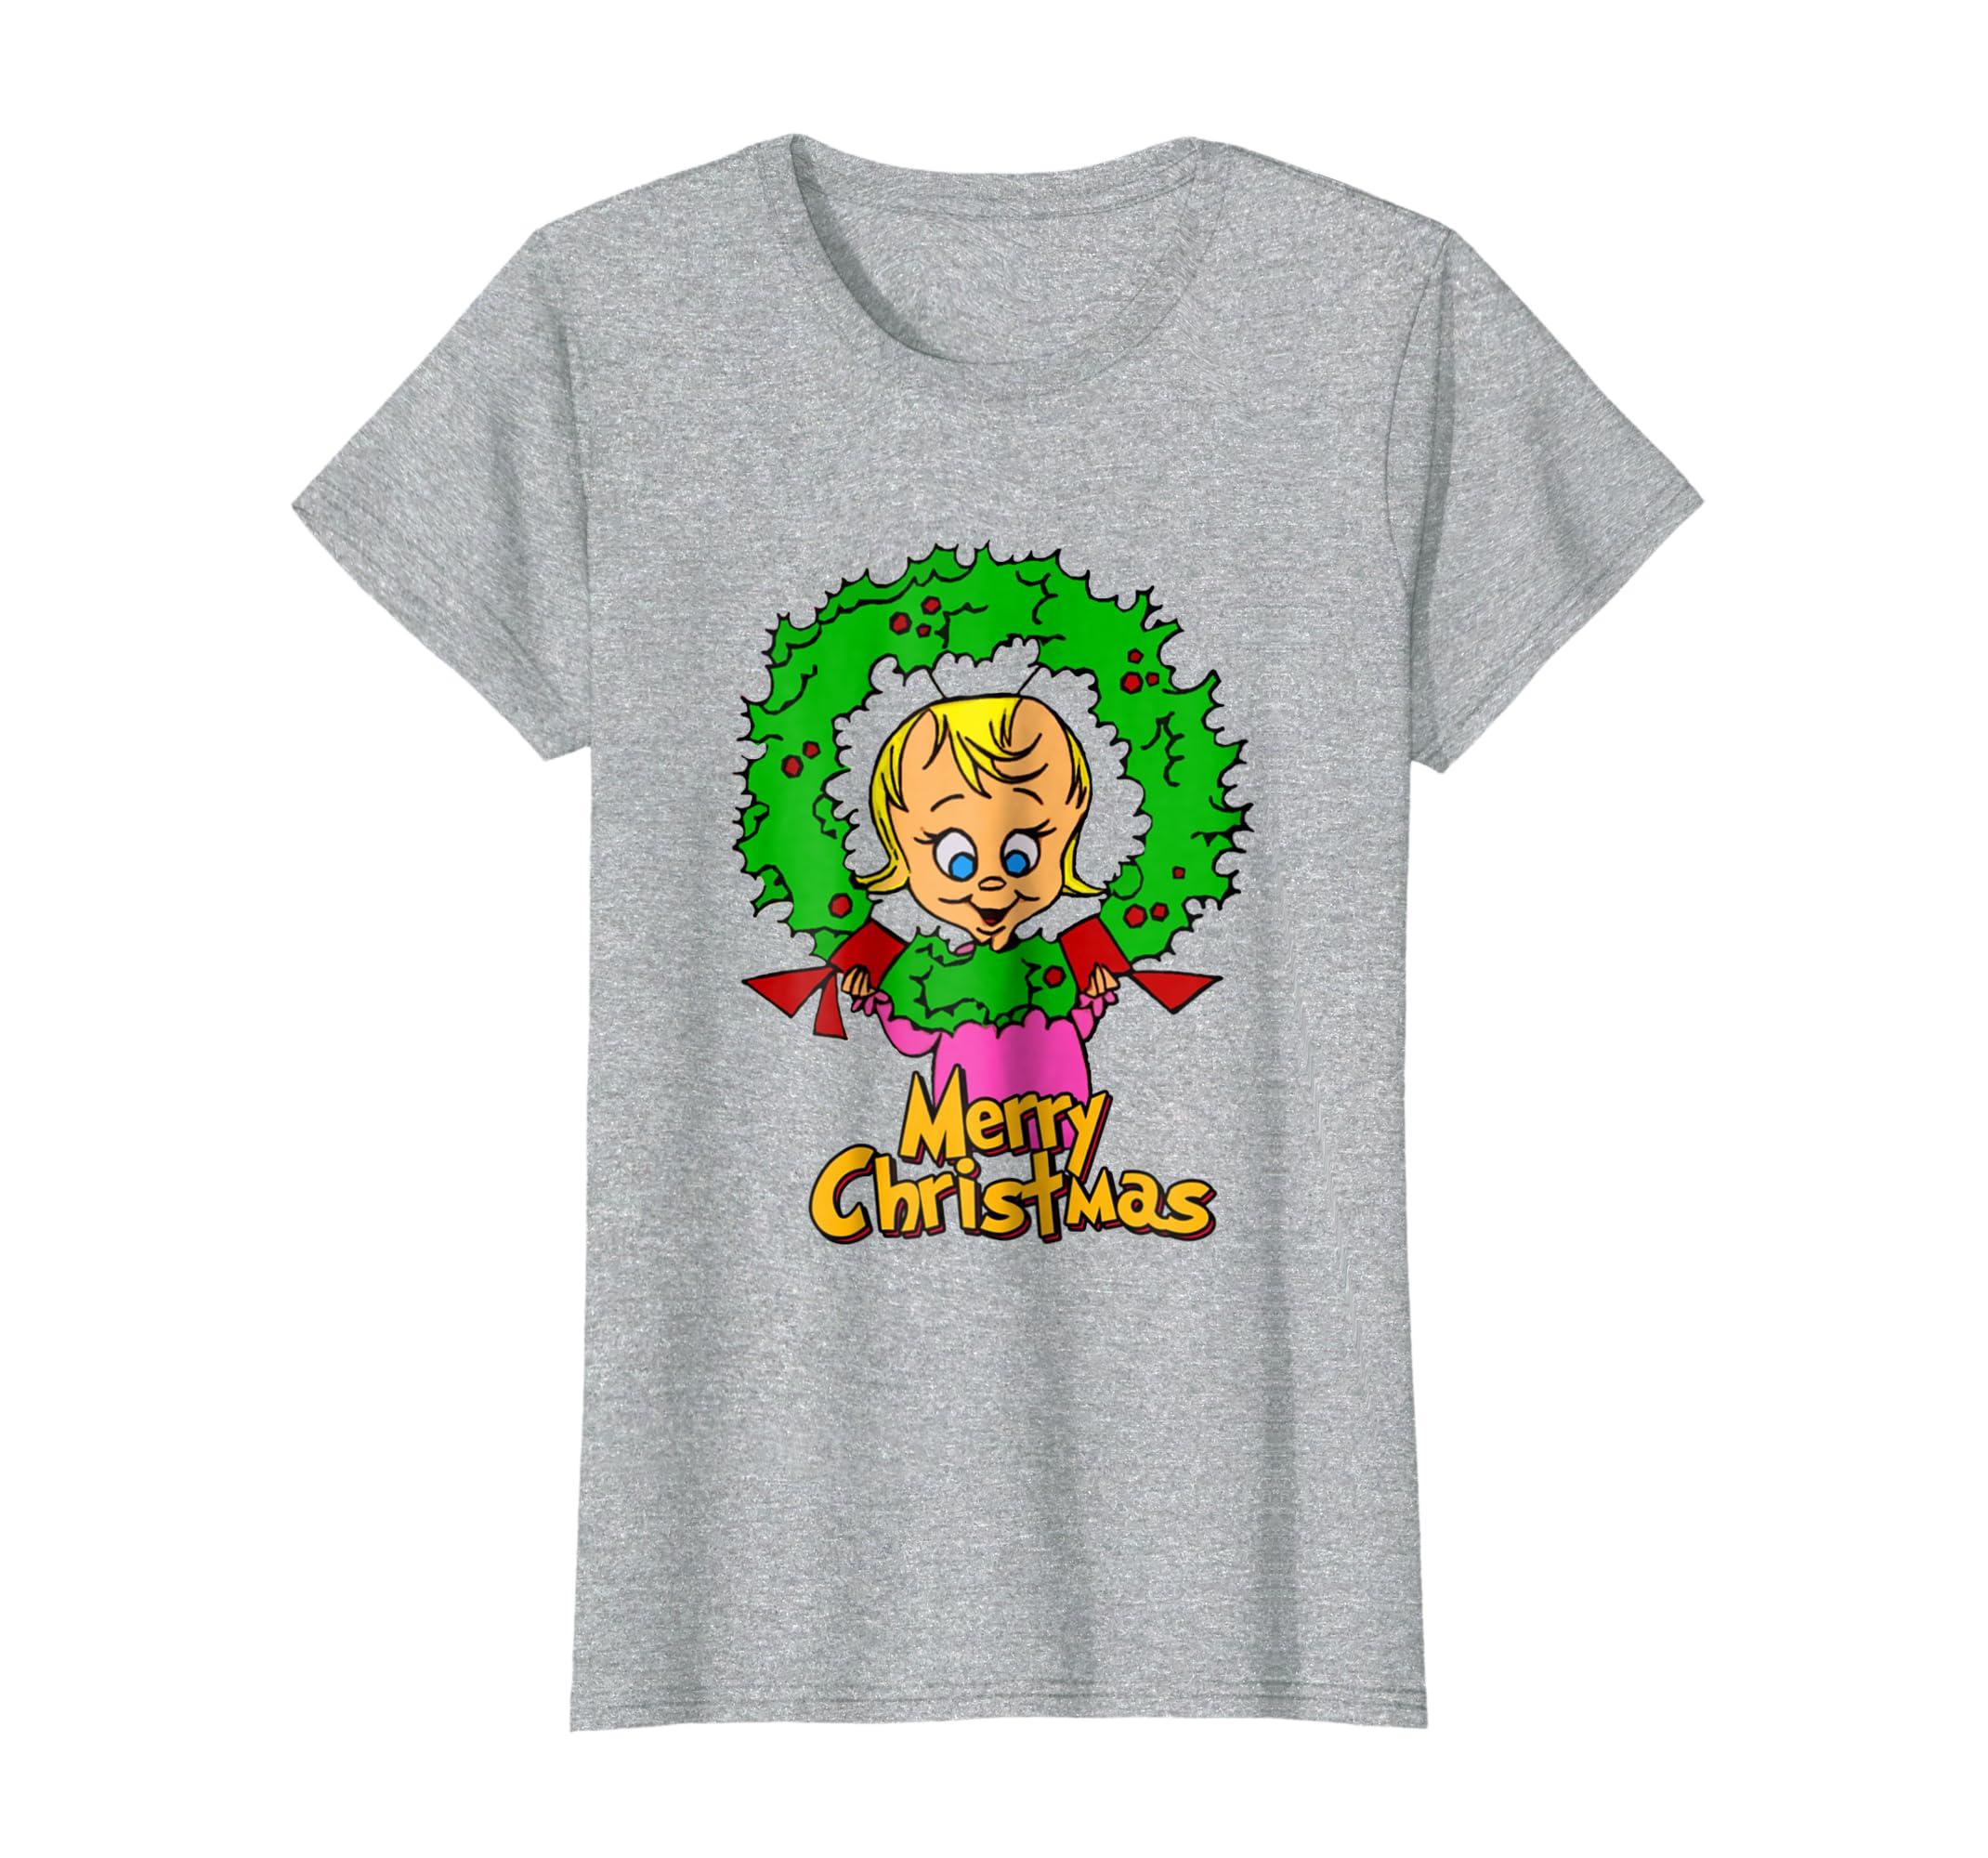 T Shirt Weihnachten.Amazon Com Frohe Weihnachten T Shirt Cindy Lou Clothing